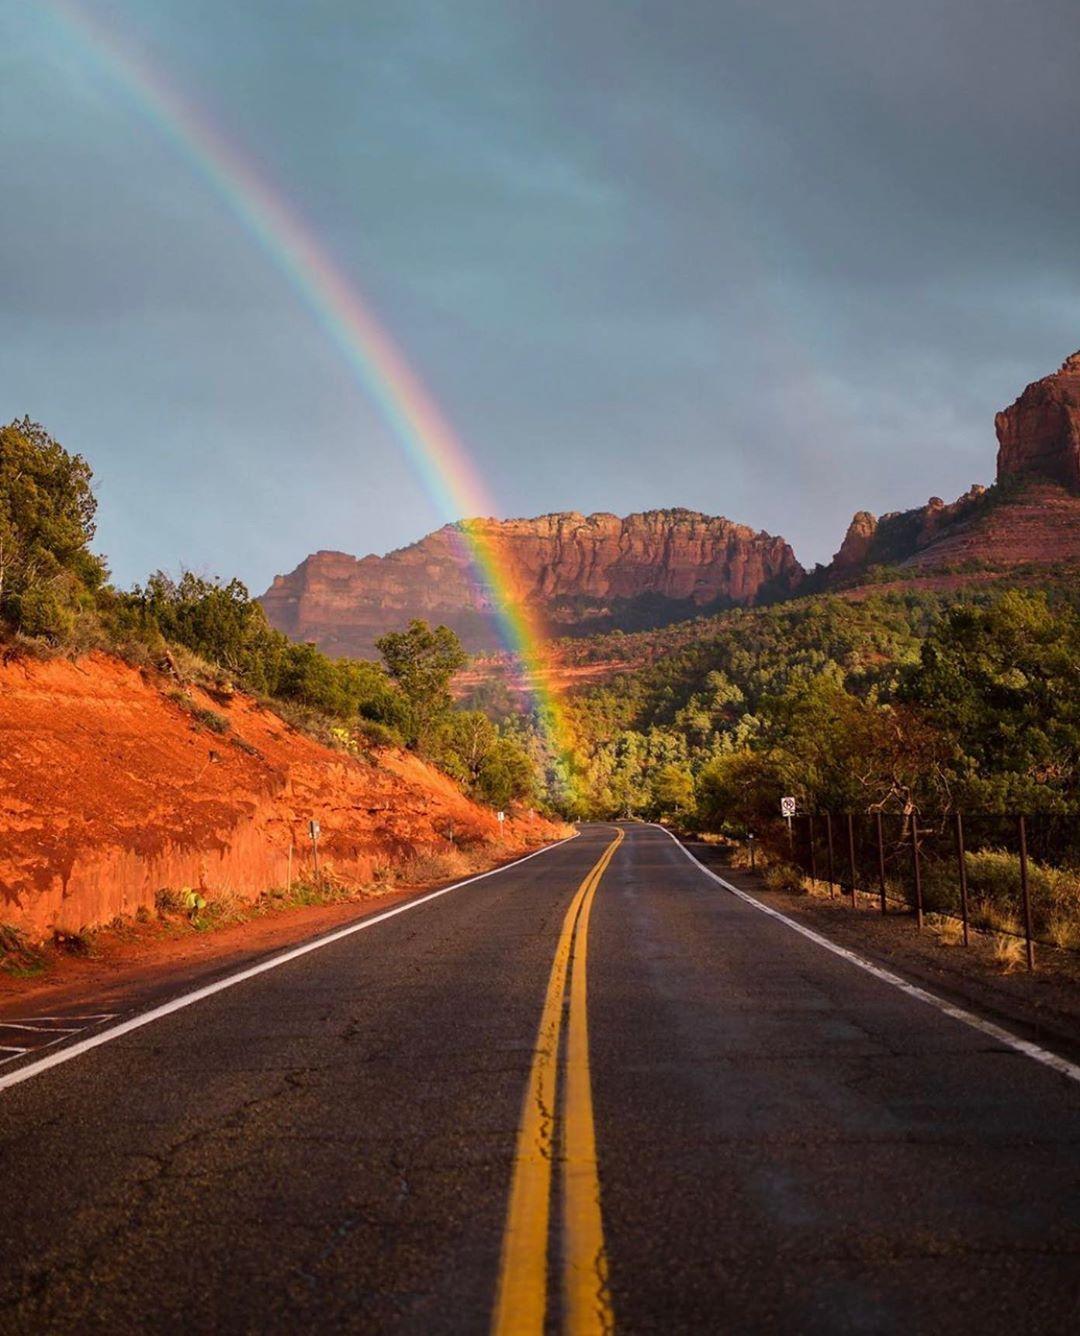 Incredible capture from Sedona, Arizona! 😍🌈 ↠ Use